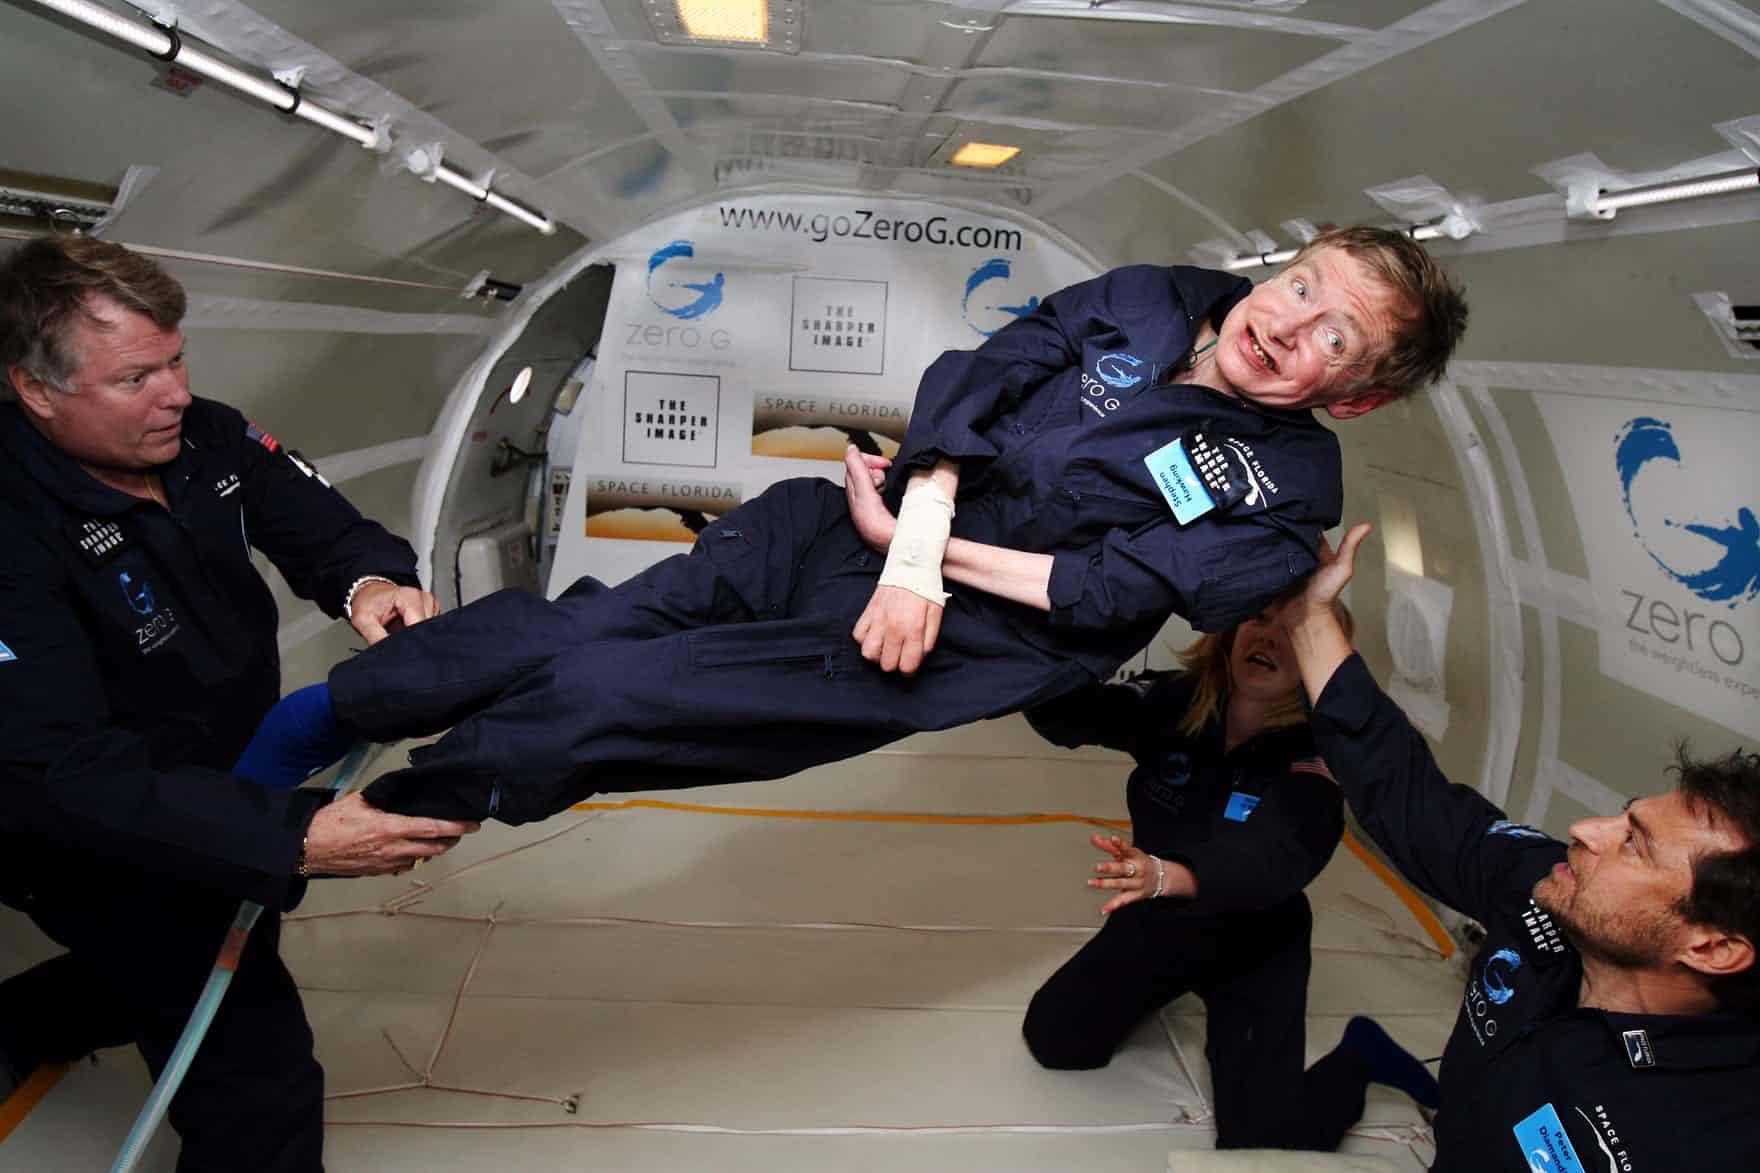 Stephen Hawking 11 -elleman